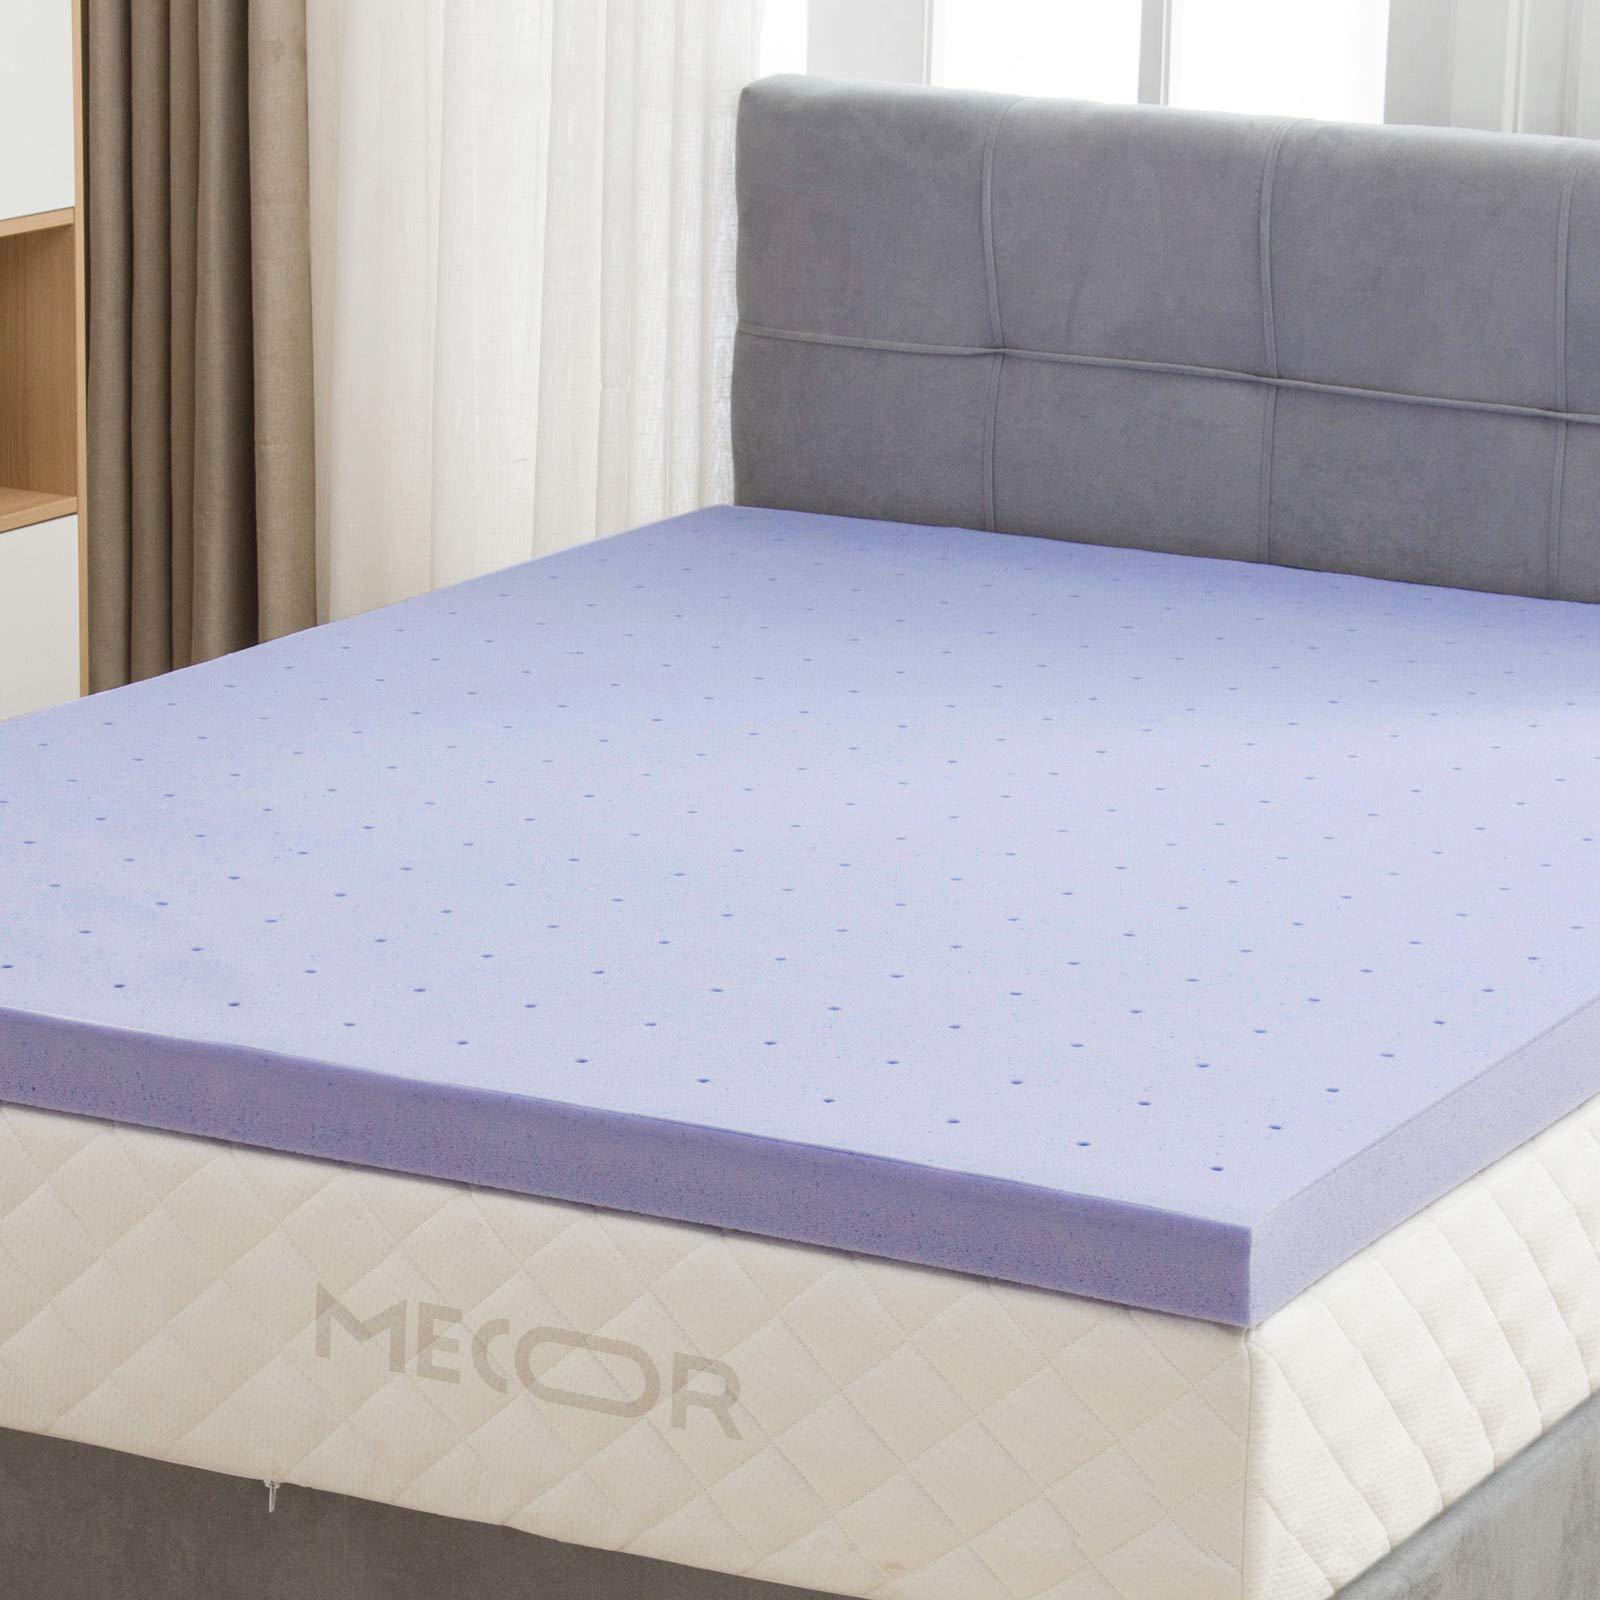 Mecor 4 Inch 4'' Gel Infused Memory Foam Mattress Topper, King Size, Ventilated Design, CertiPUR-US Certified Foam-Purple